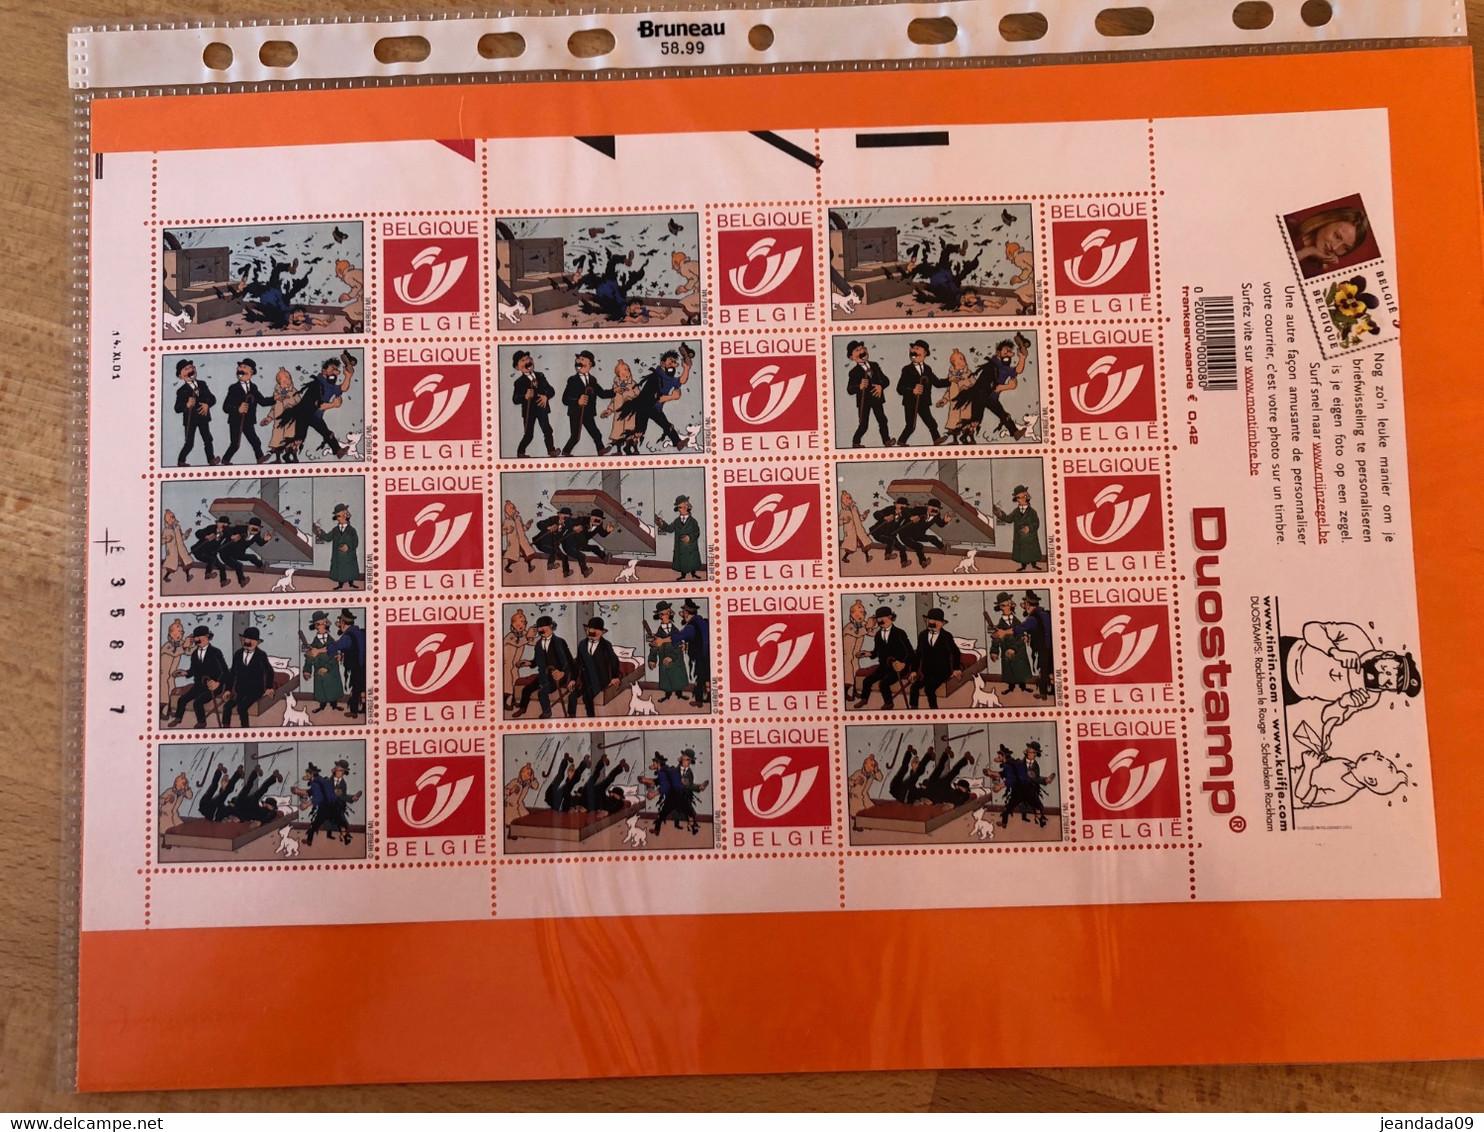 14-11-2001 DOSTAMP TINTIN Feuille De 15 Timbres Personnalisés Hergé Moulinsart 7 Les Dupont/Haddock/Tintin - Unused Stamps